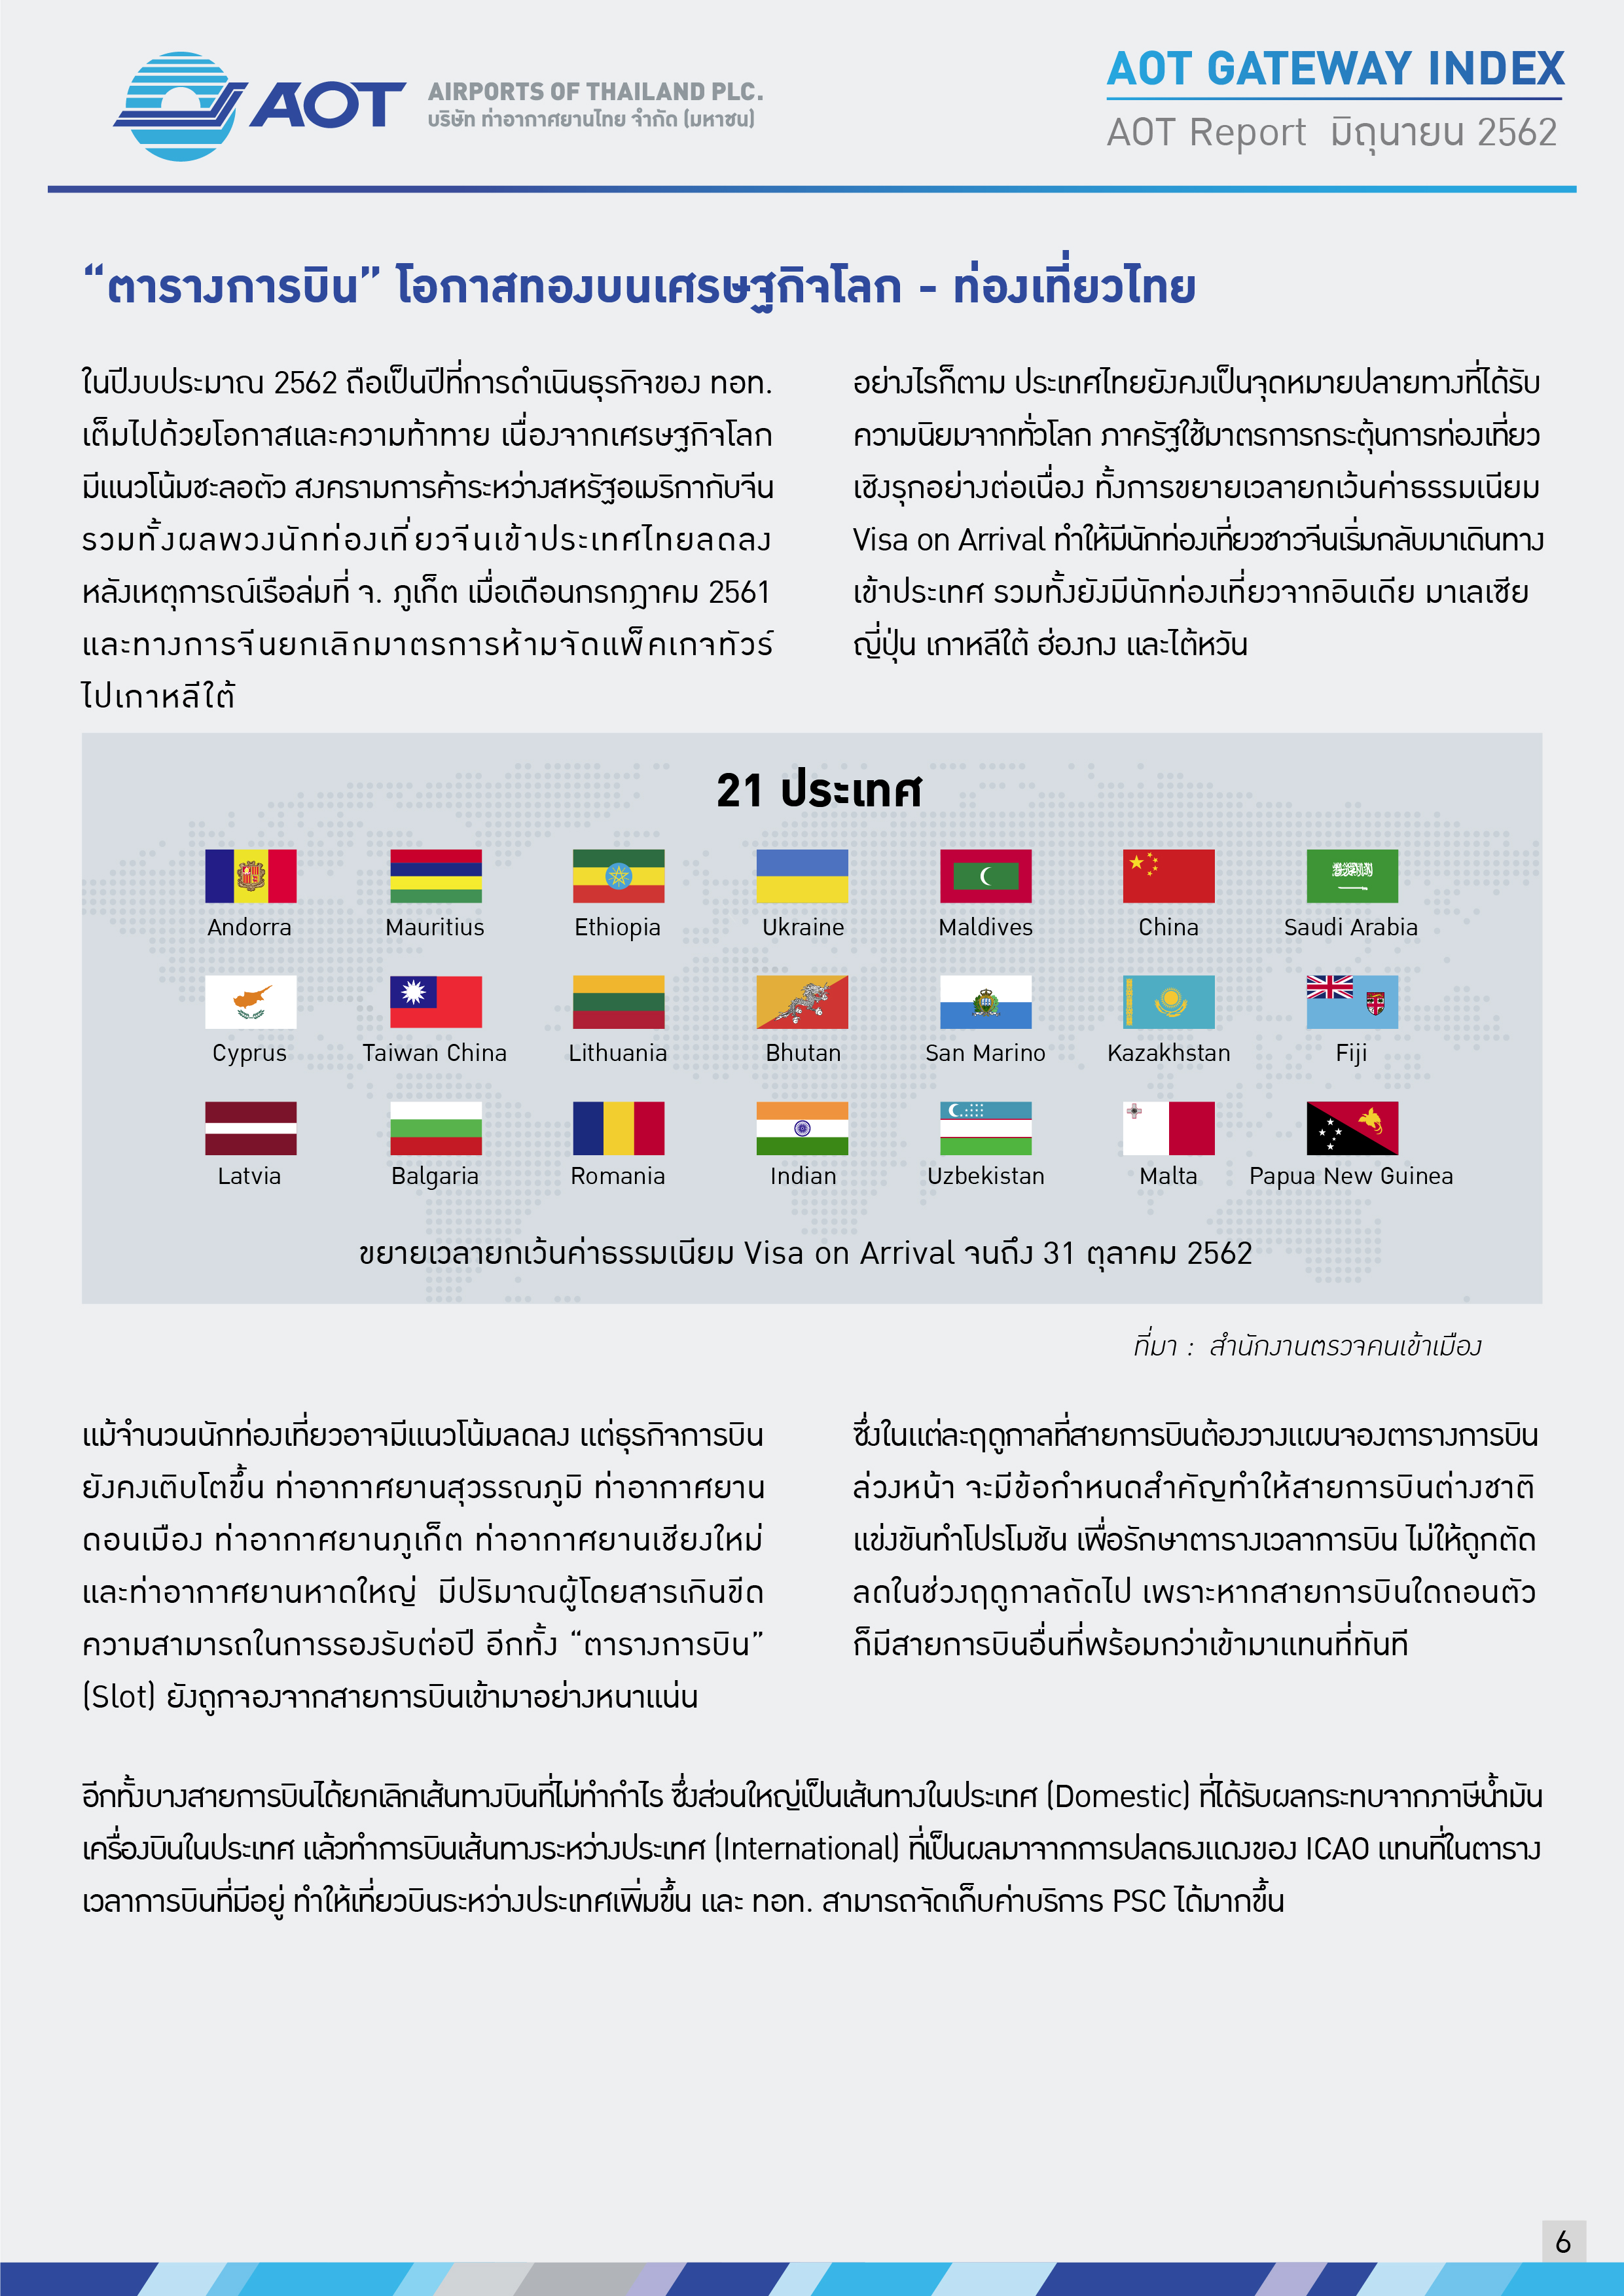 AOTcontent2019_Index7_AOT นิวไฮต่อเนื่อง 4 ปีซ้อน _ มุ่งสู่ปีที่ 5 โอกาสและความท้าทาย_V3_20190828_Page06